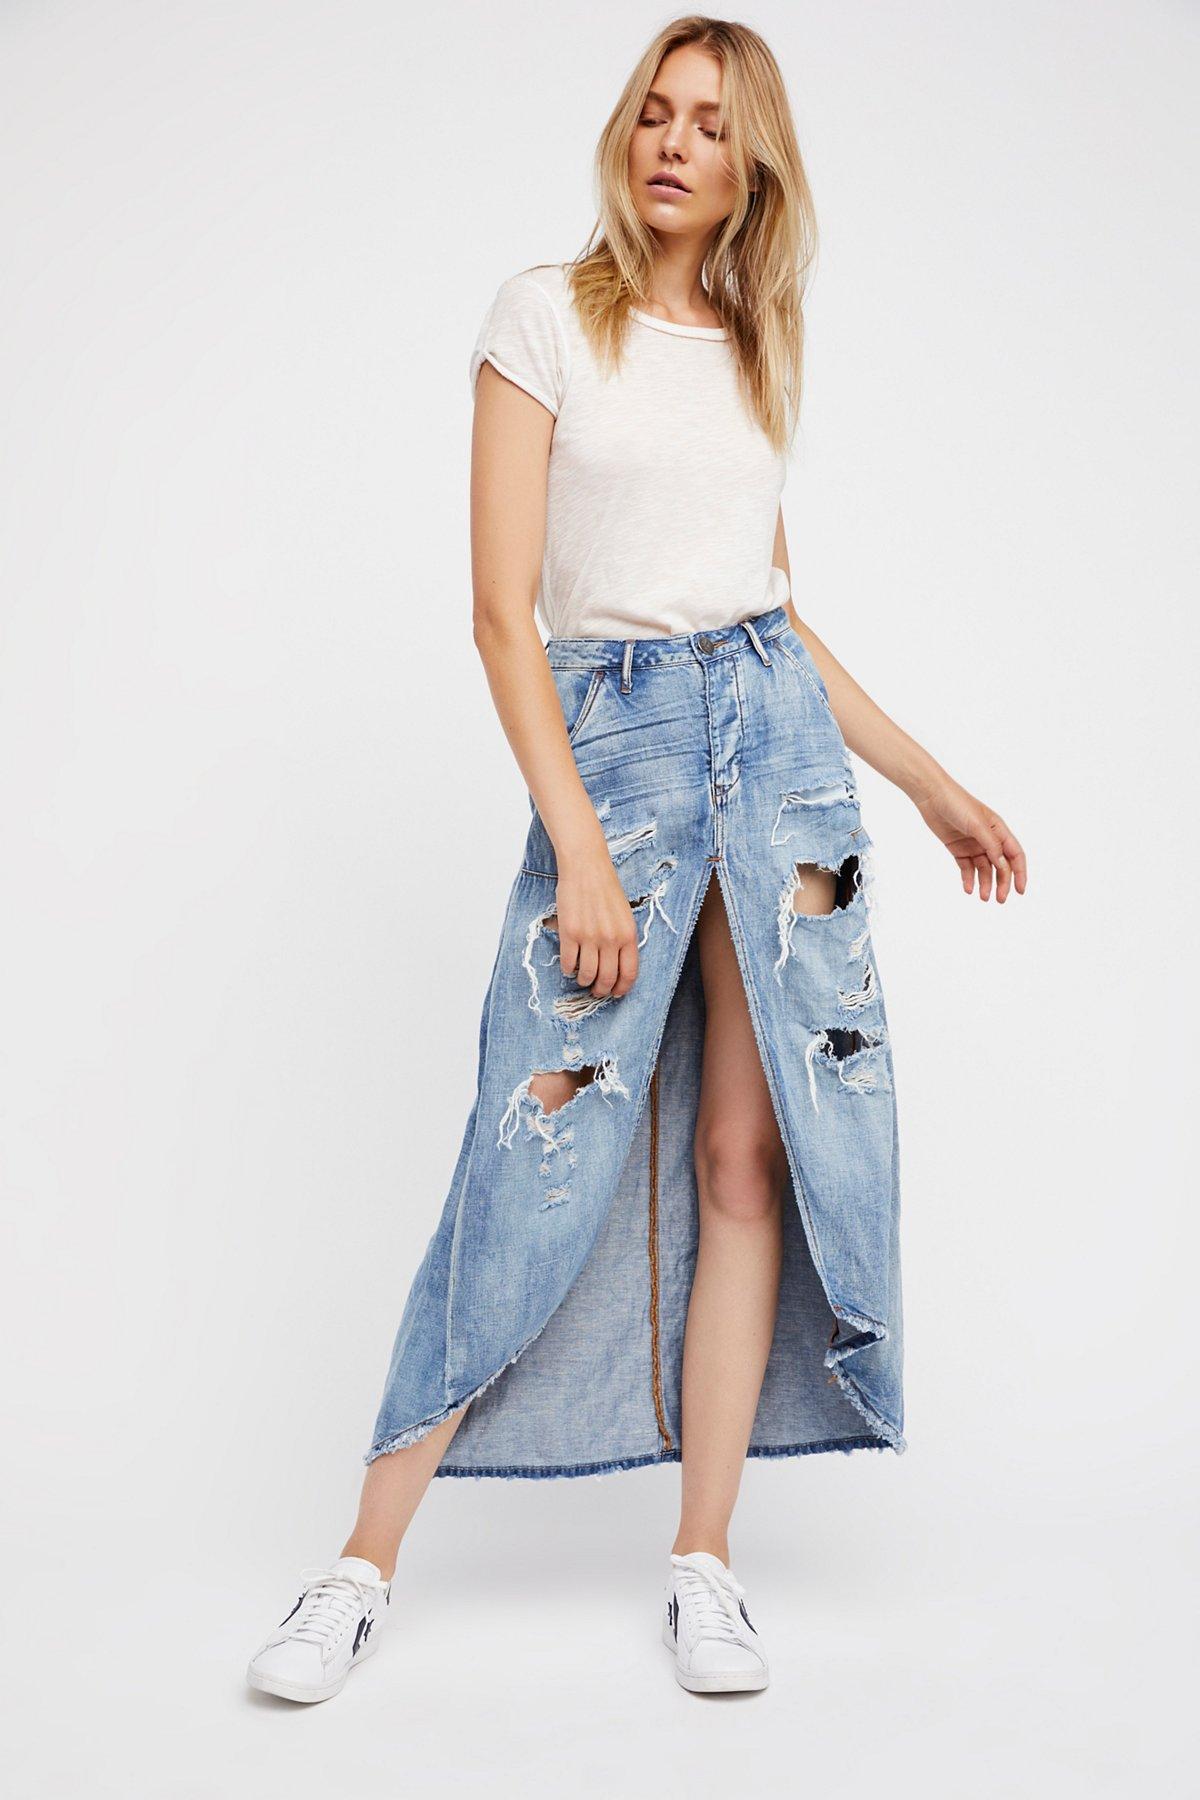 Distressed To Impress Denim Skirt